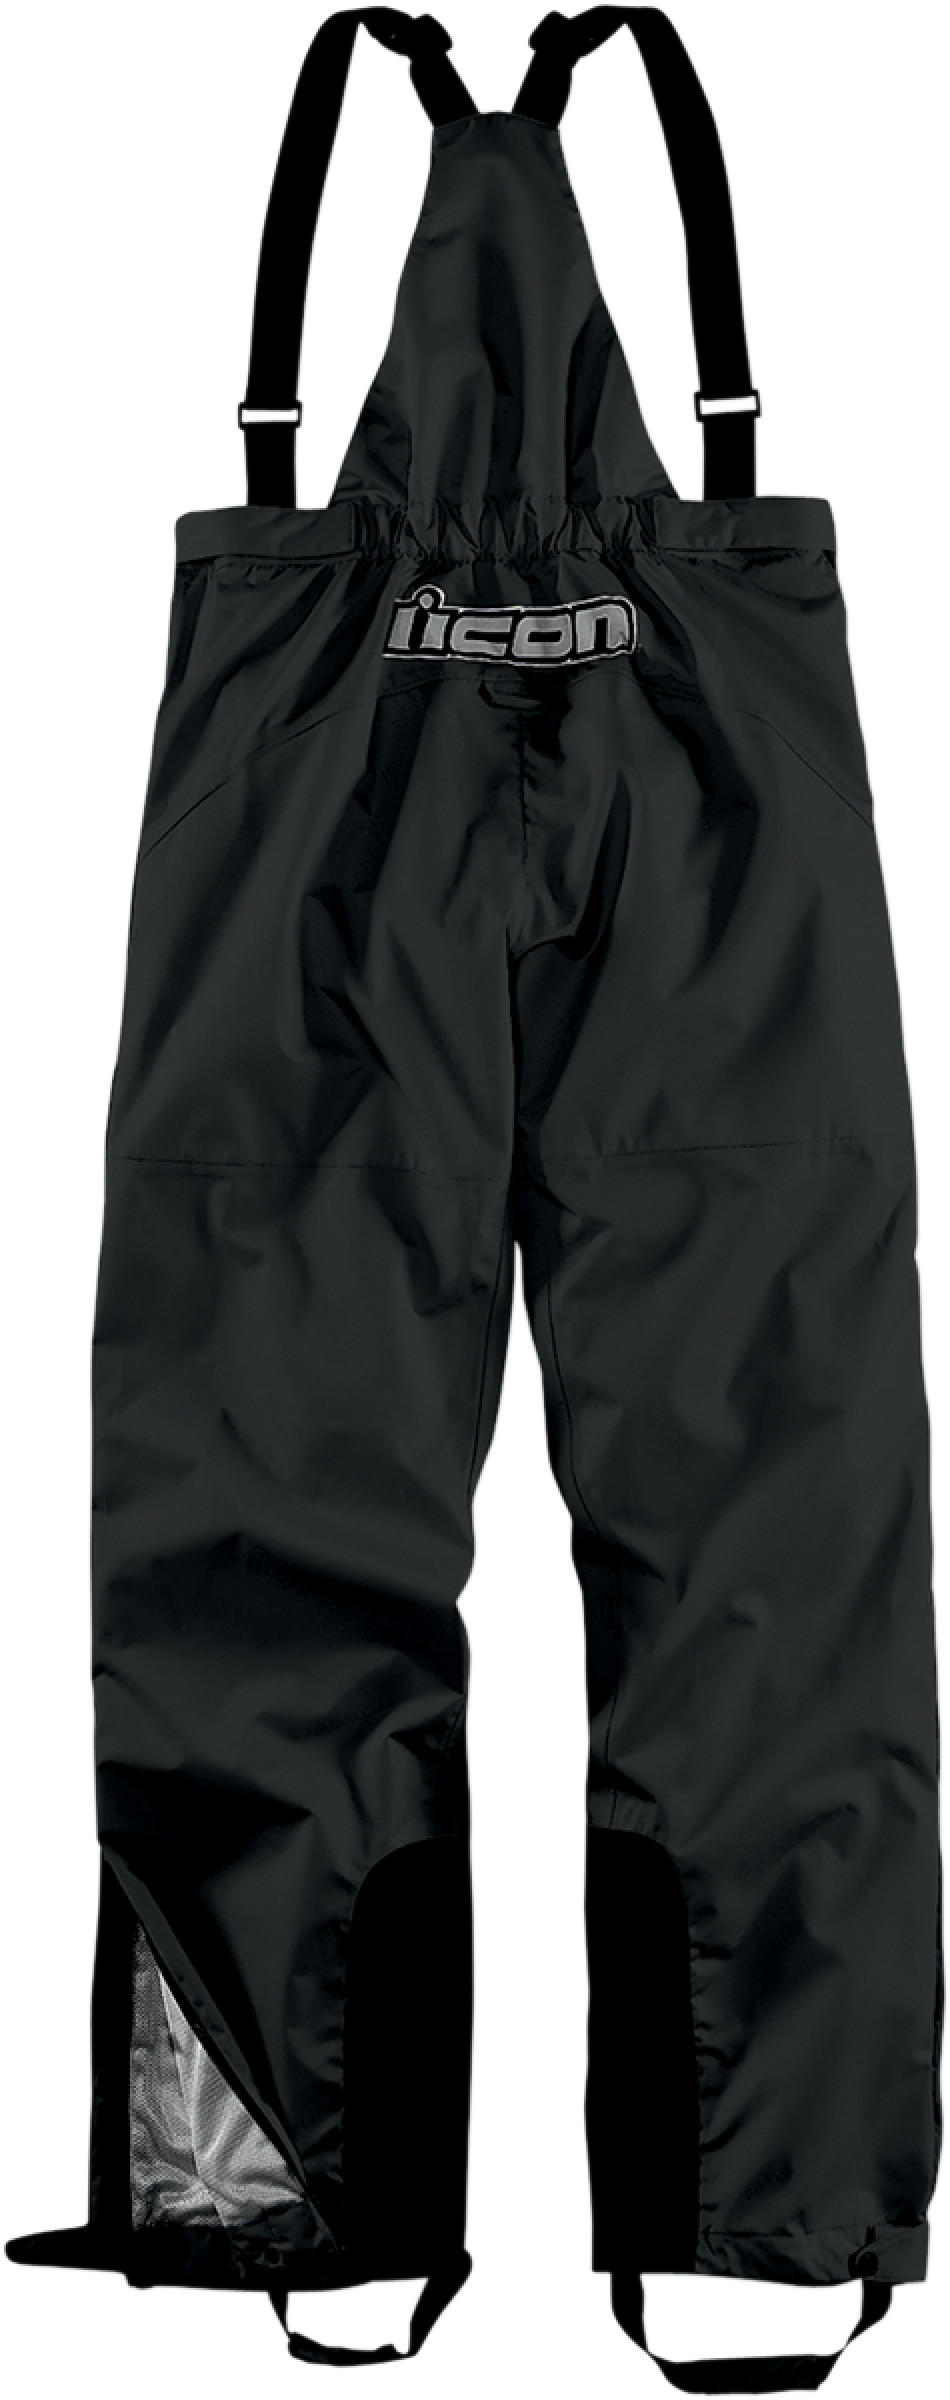 【ICON】吊帶褲 BIB PDX BLACK - 「Webike-摩托百貨」